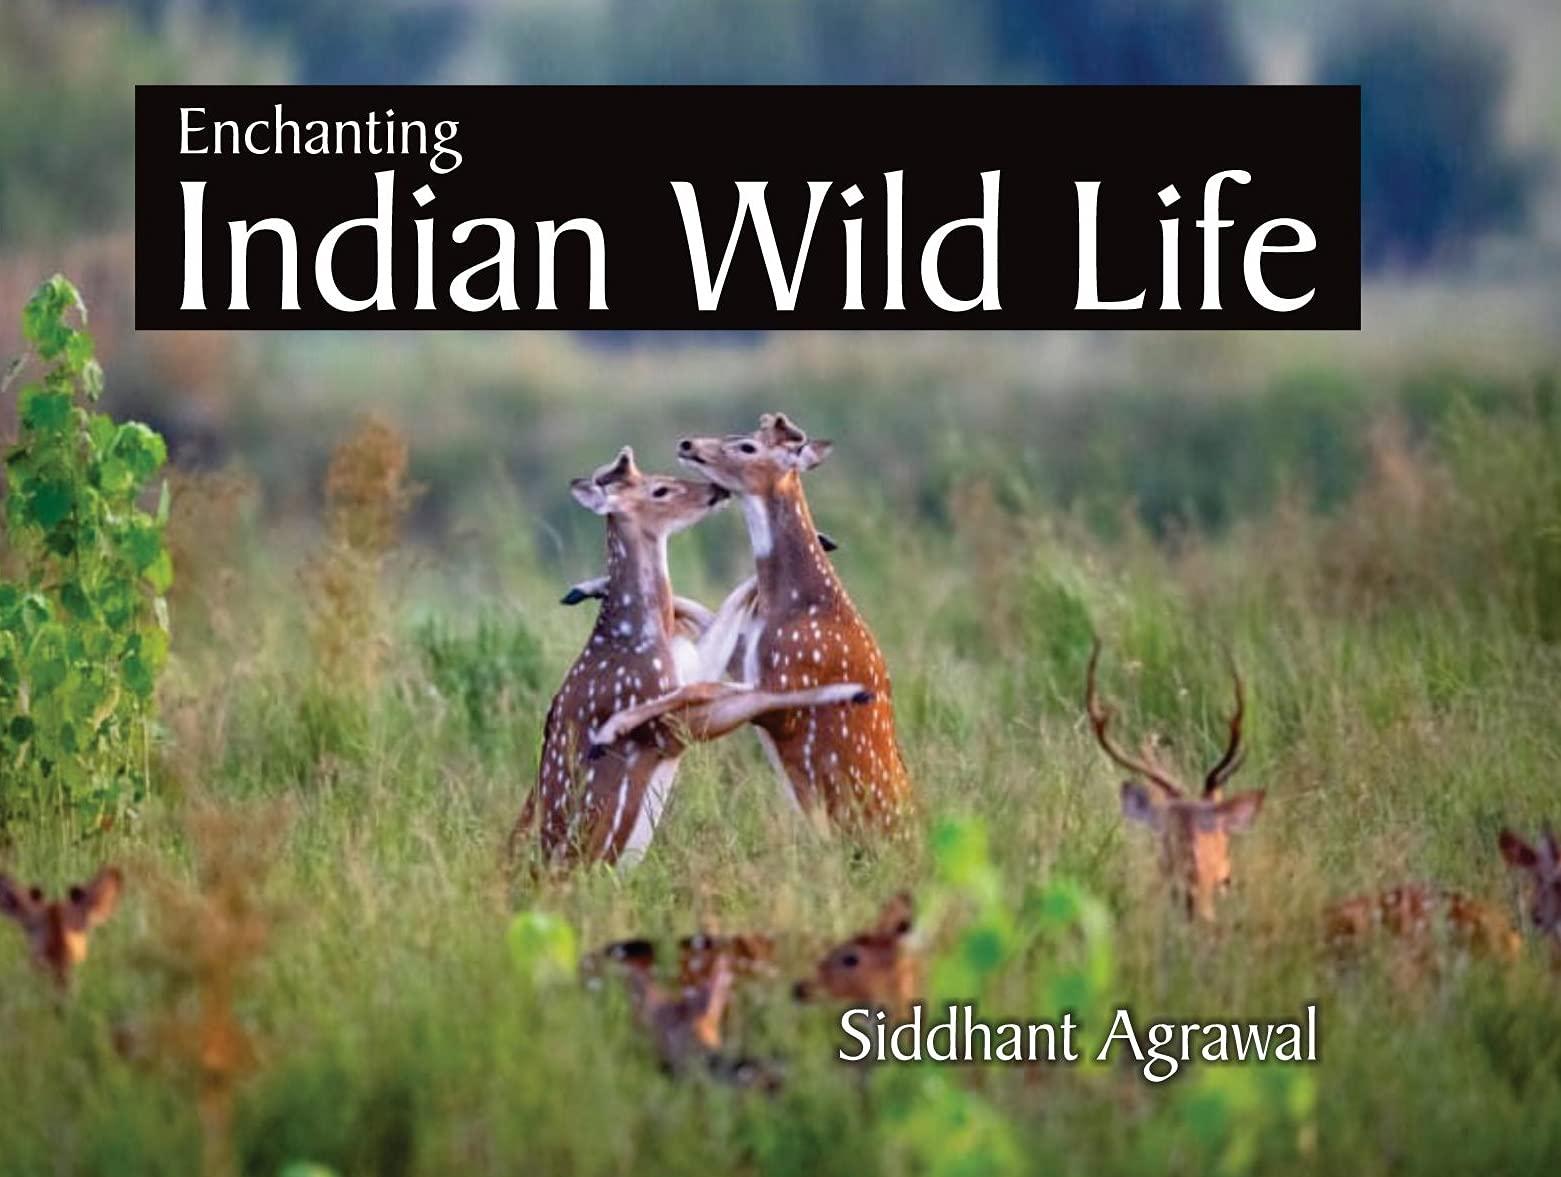 Enchanting Indian Wild Life